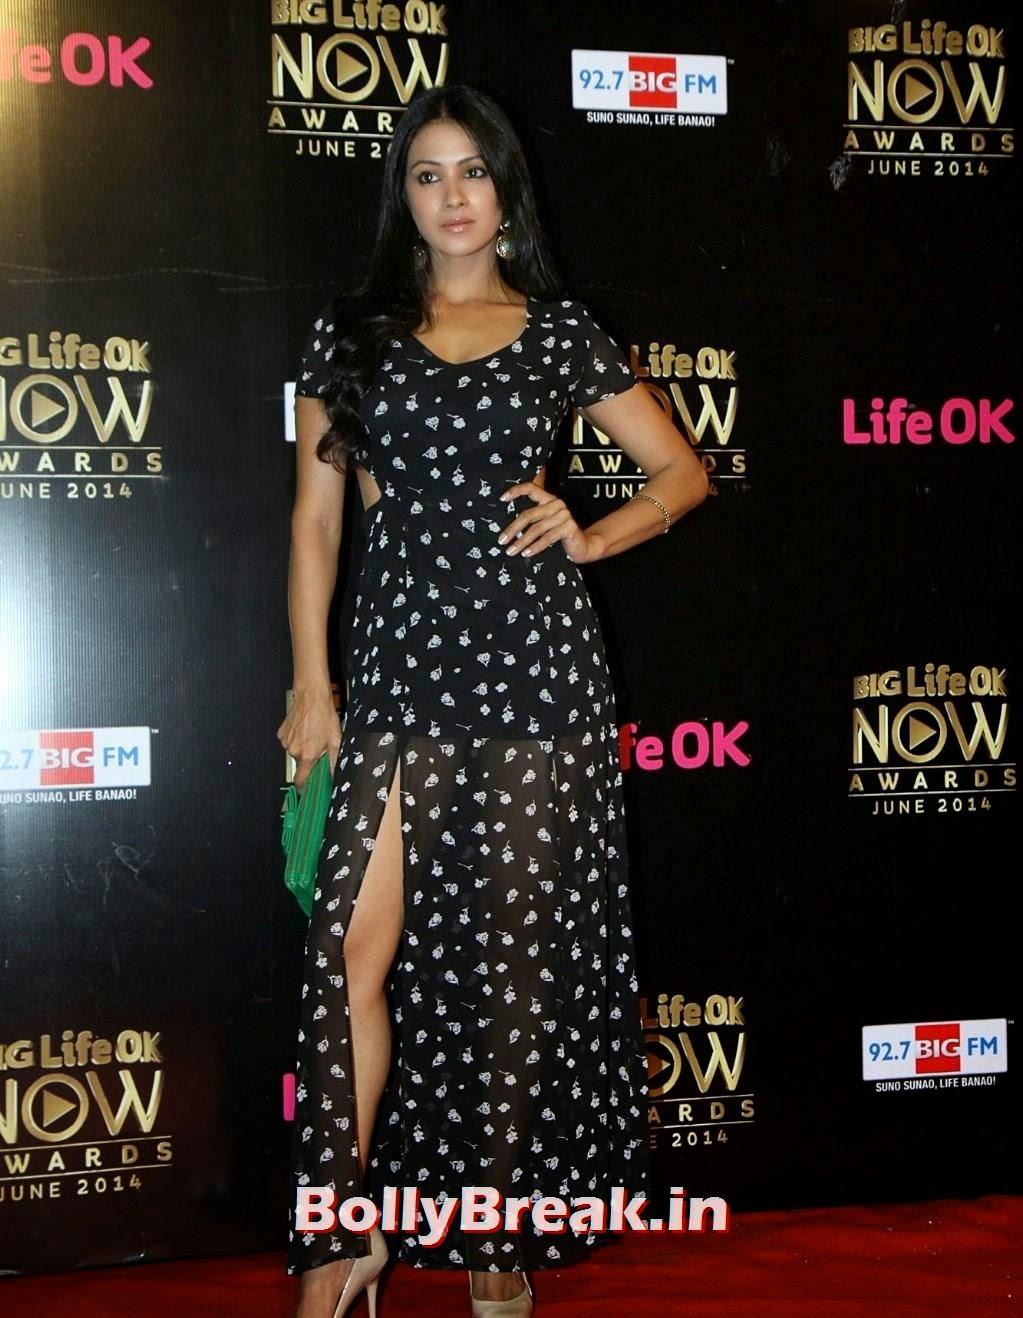 Barkha Bisht hot leg show Life Ok Now Awards 2014, Barkha Bisht Latest Hot HD Pics from Life Ok Now Awards 2014